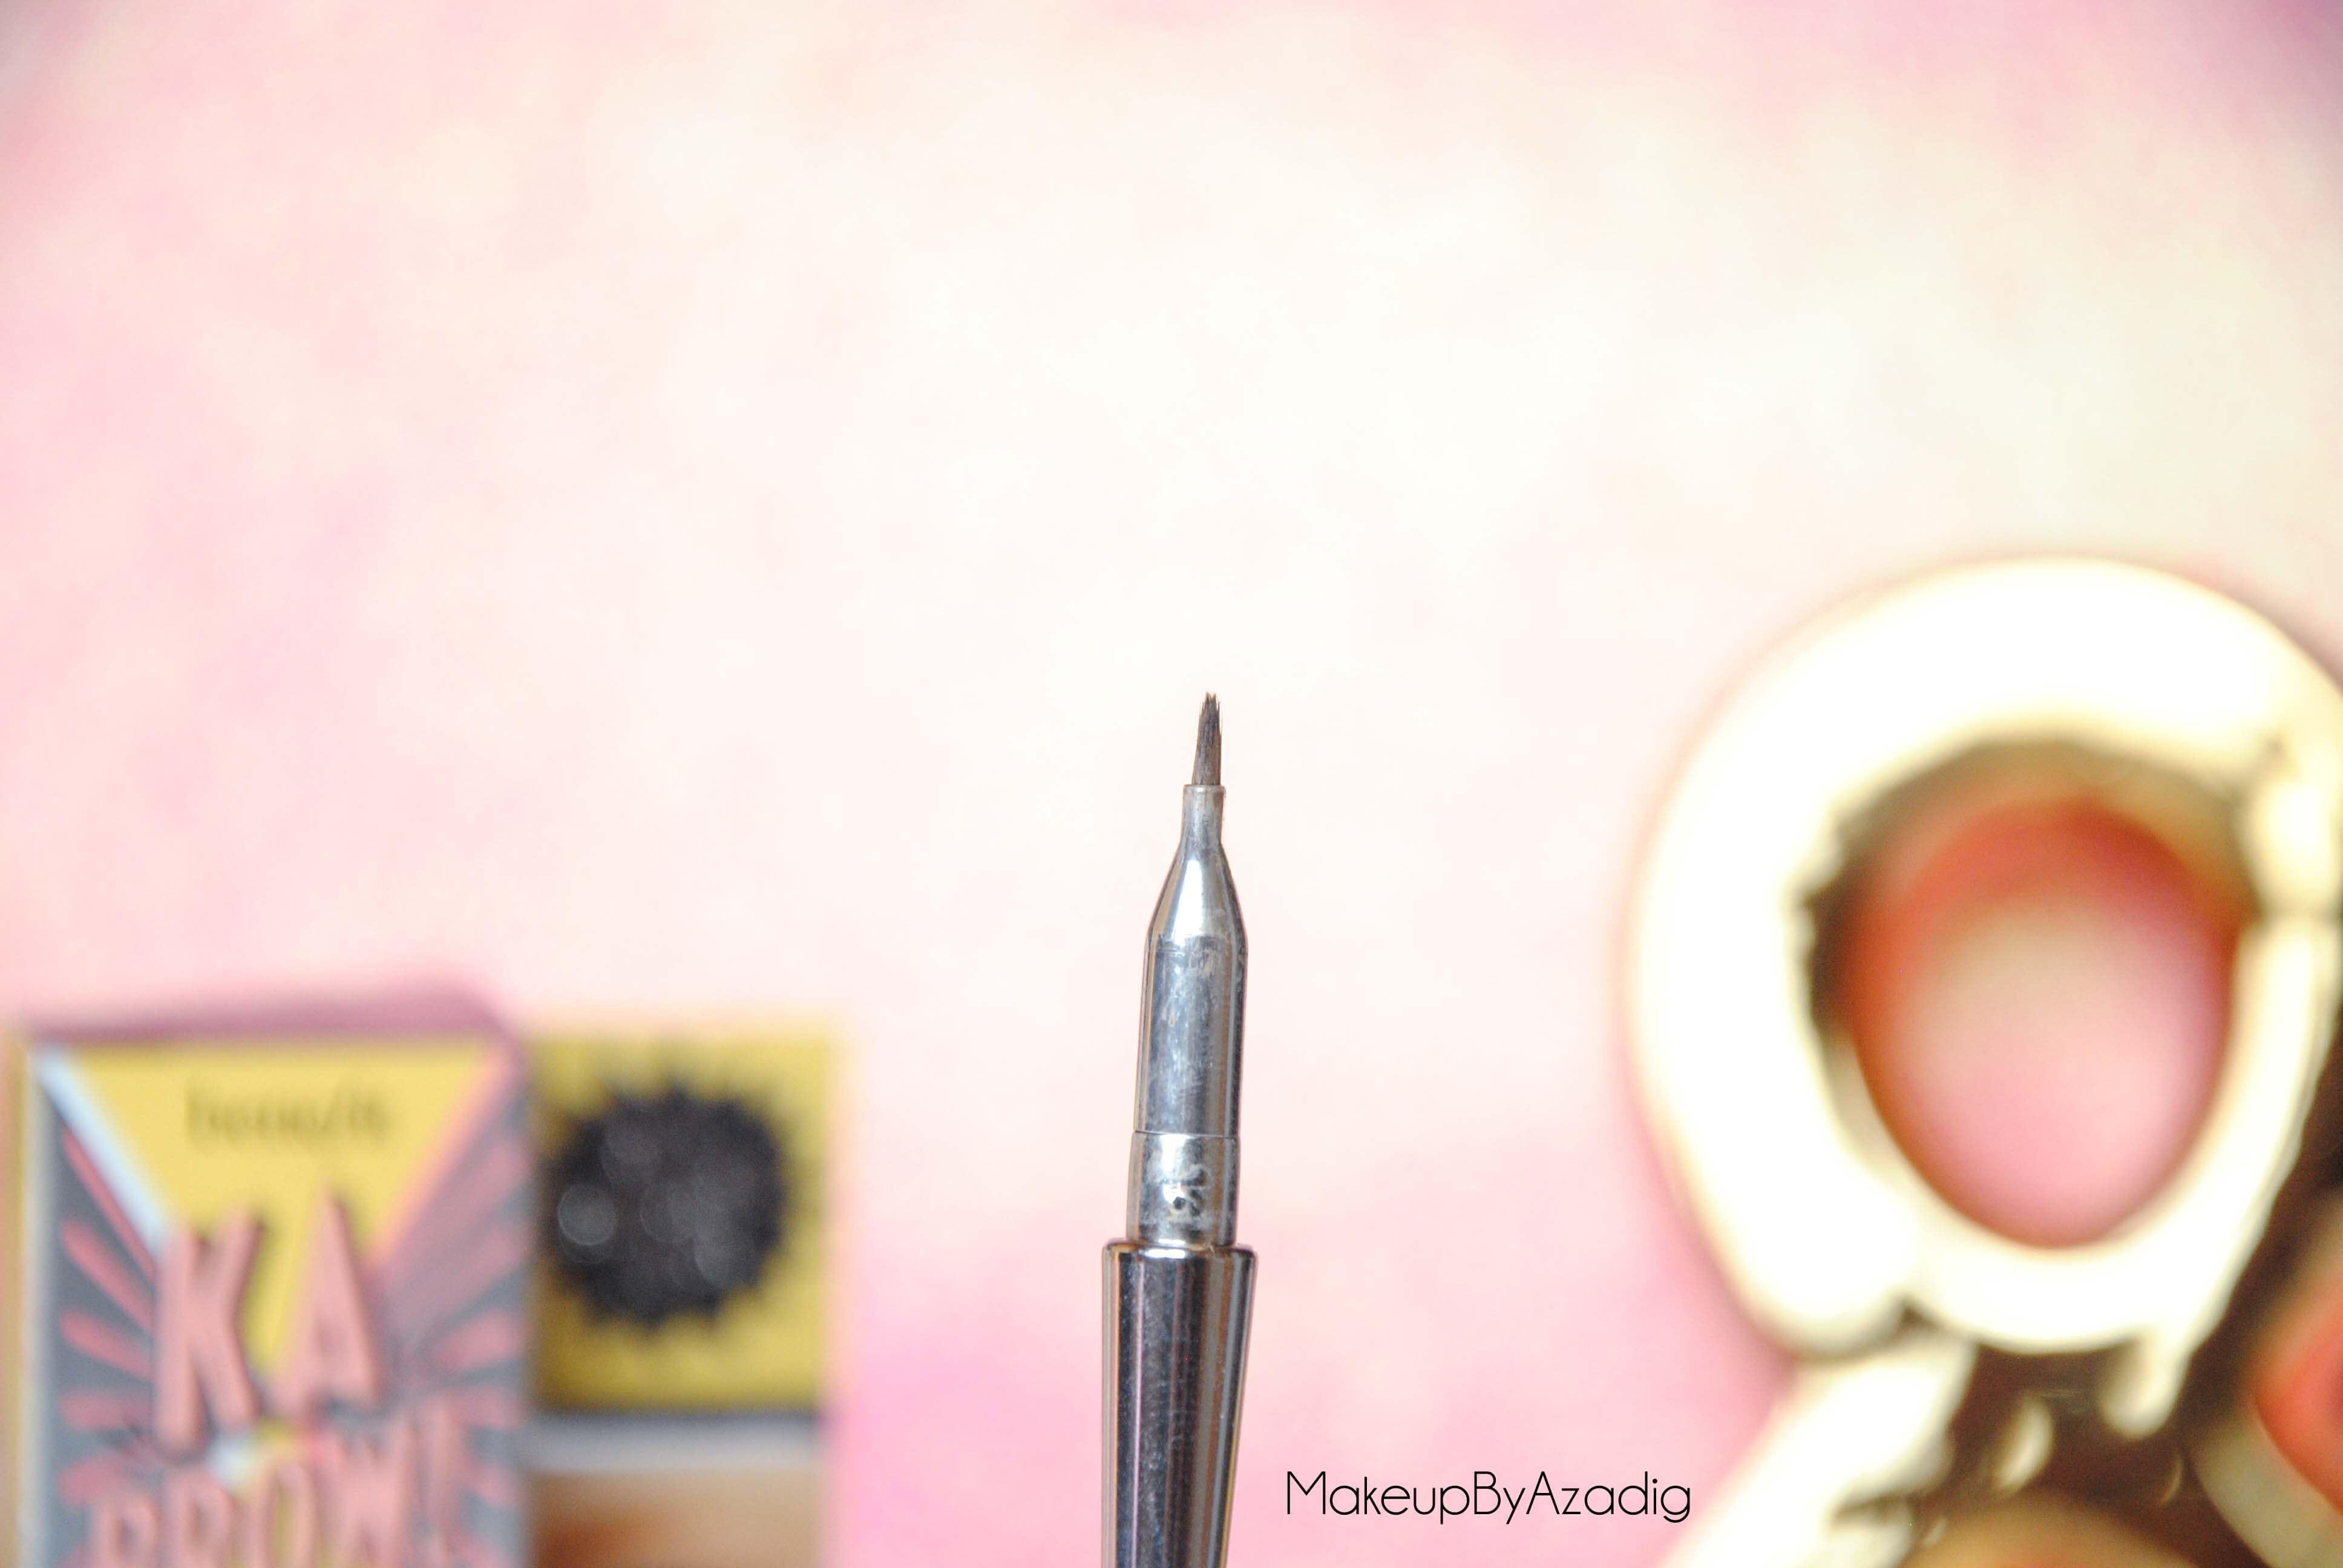 ka-brow-gel-creme-coloration-sourcils-benefit-makeupbyazadig-paris-blog-revue-avis-prix-enjoyphoenix-pinceau